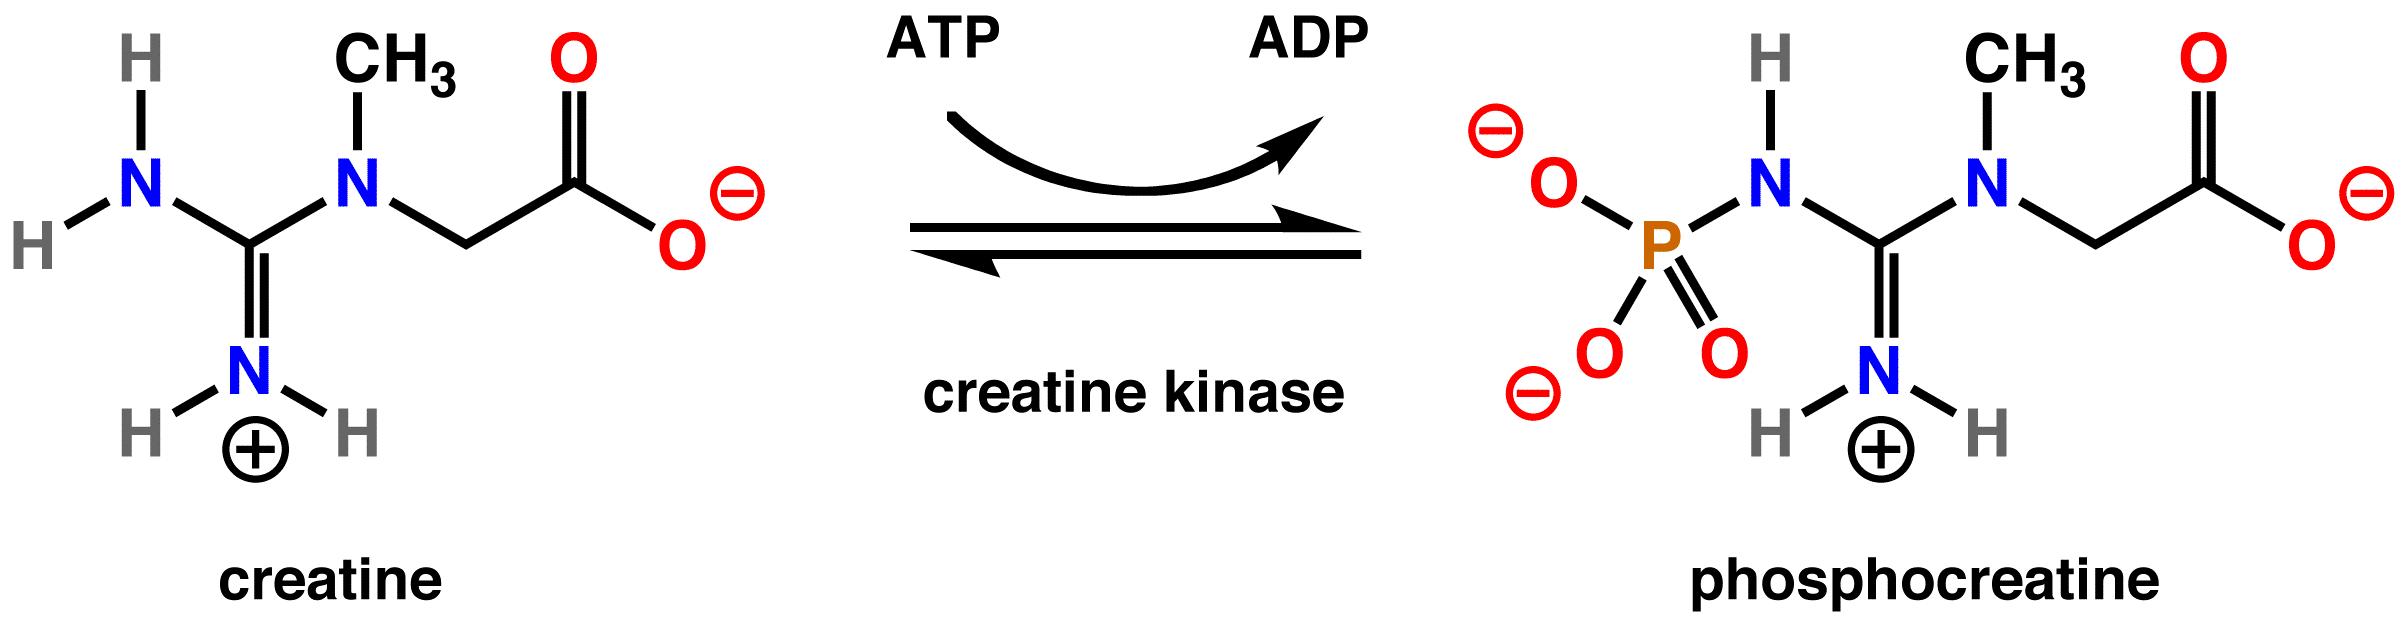 In humans creatine kinase converts creatine to phosphocreatine